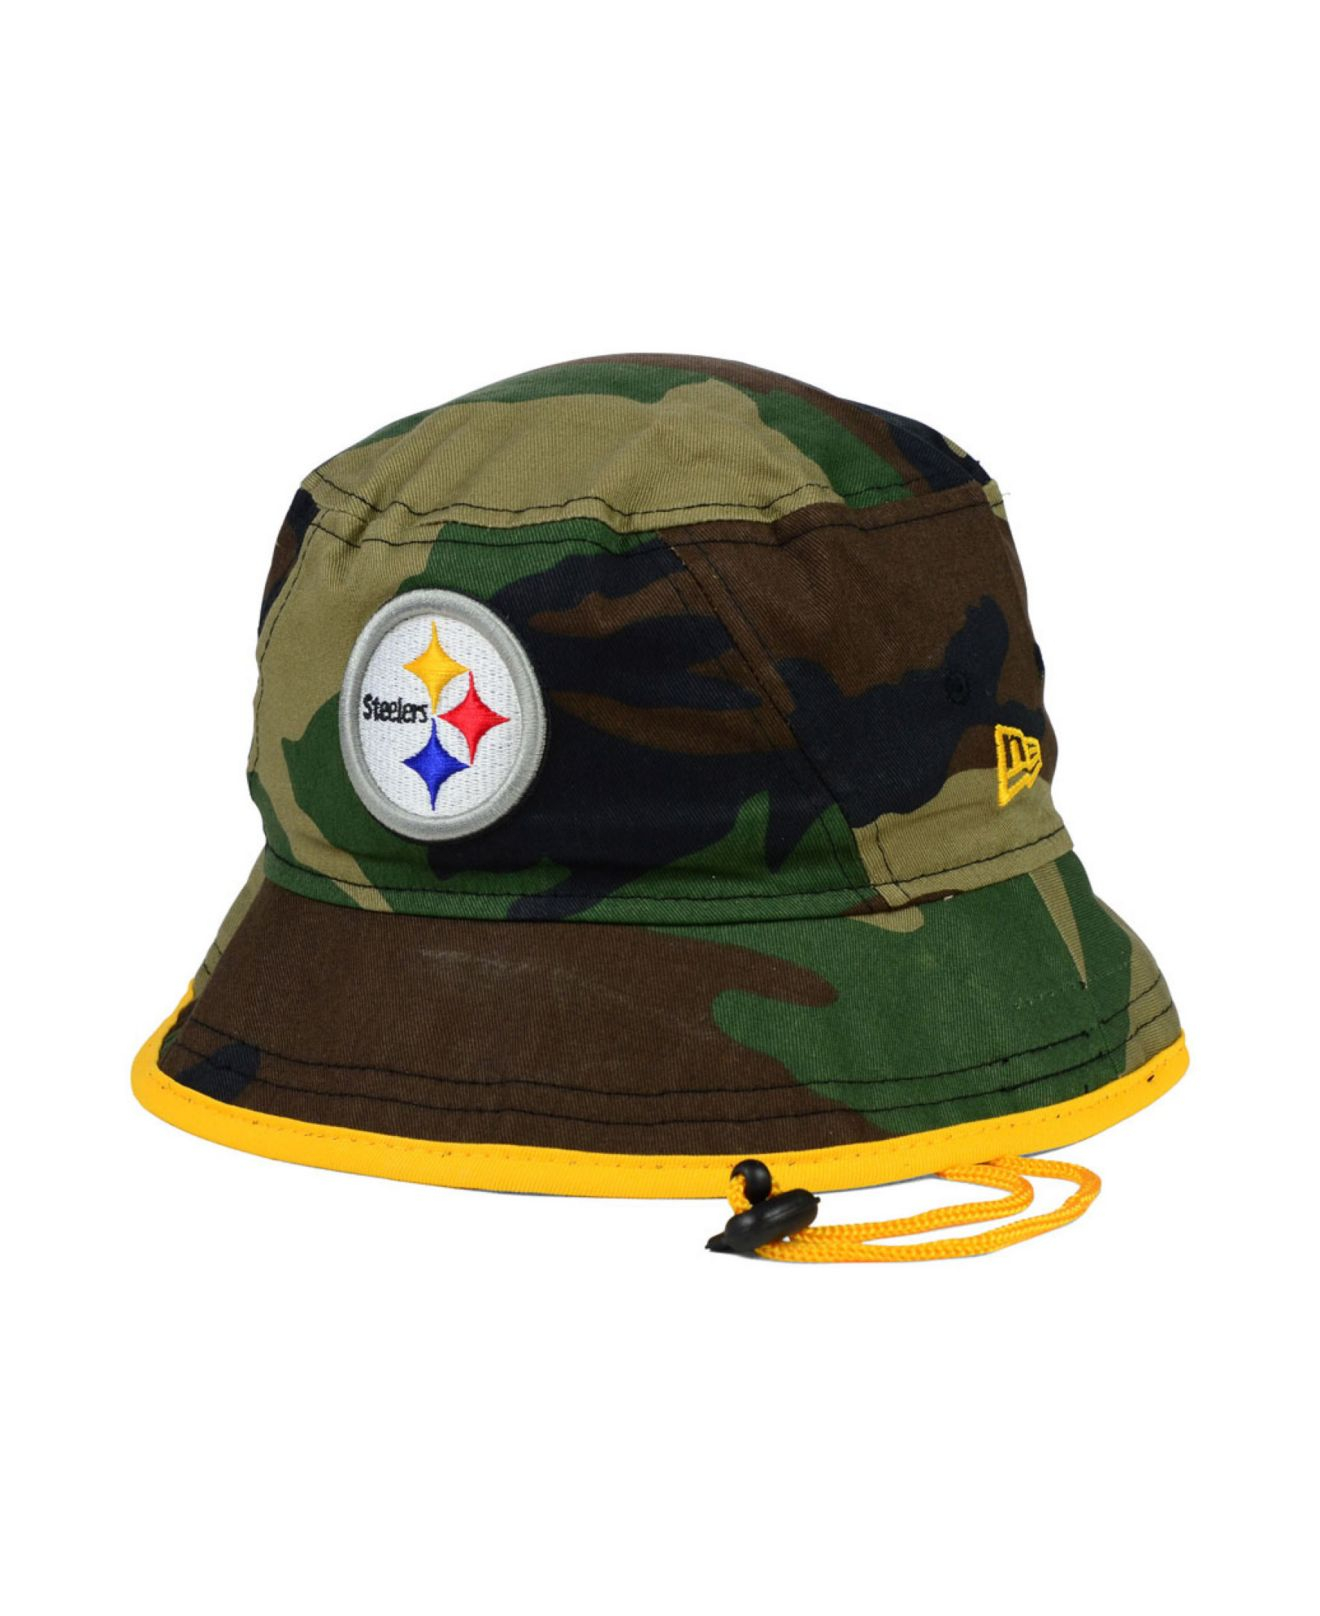 4aaa43539ae ... uk lyst ktz pittsburgh steelers camo pop bucket hat in green for men  32641 6f7c6